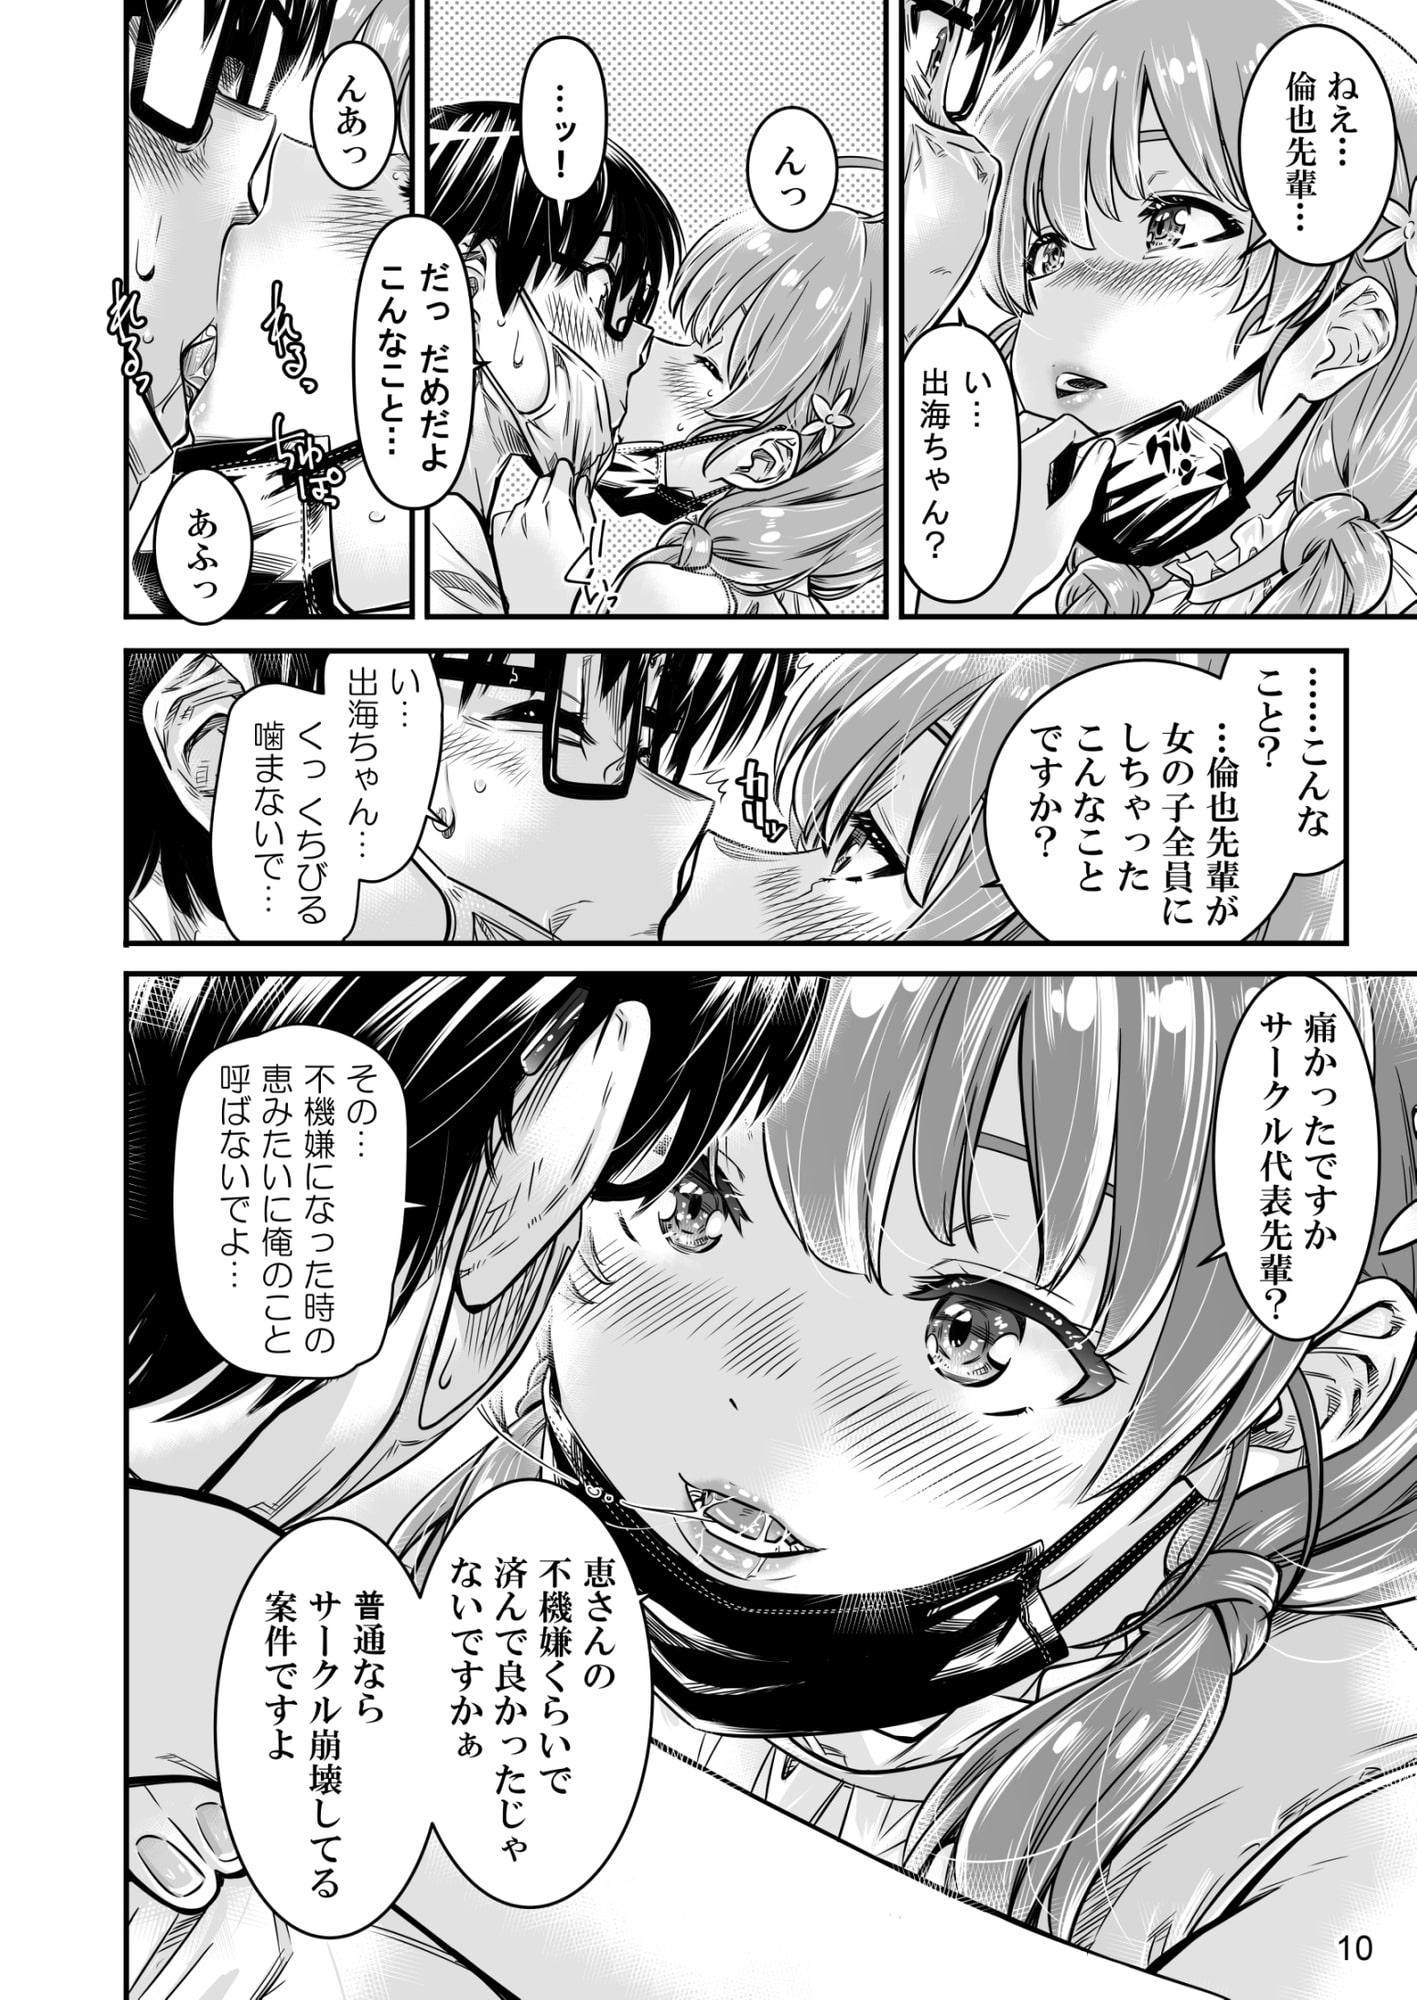 RJ328882 冴えない後輩女子の自粛り方 [20210530]